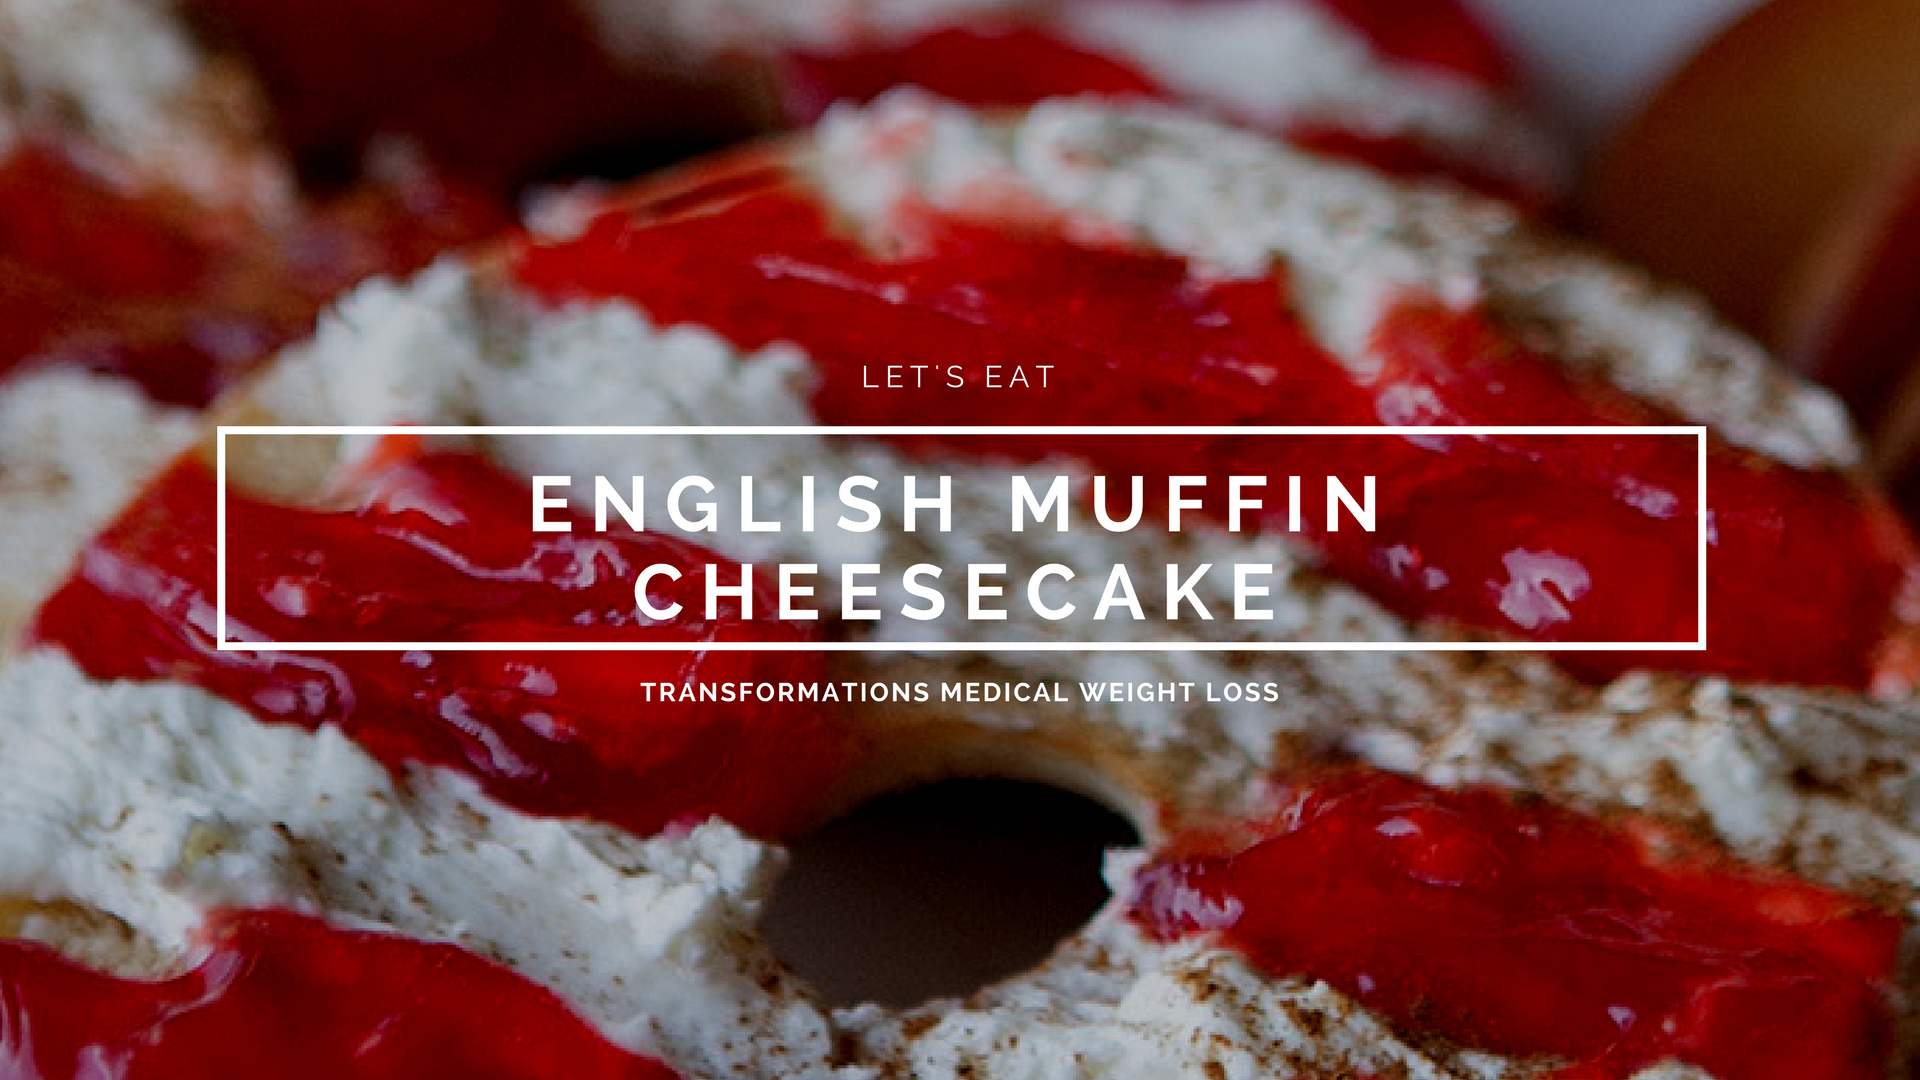 English Muffin Cheesecake